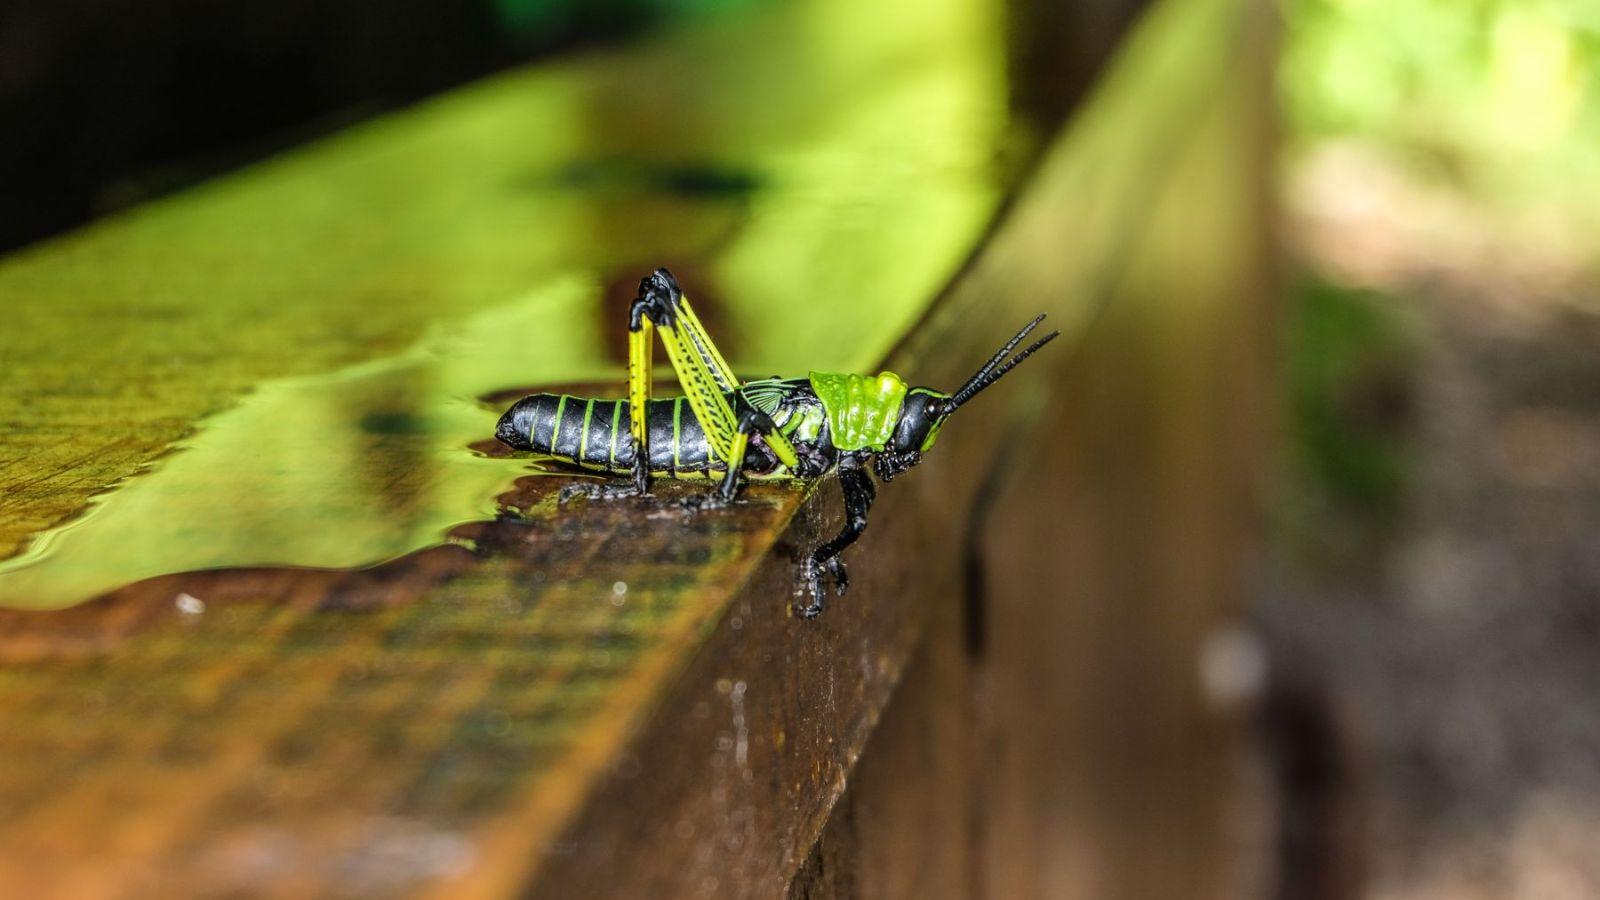 a photo of a grasshopper in south africa.